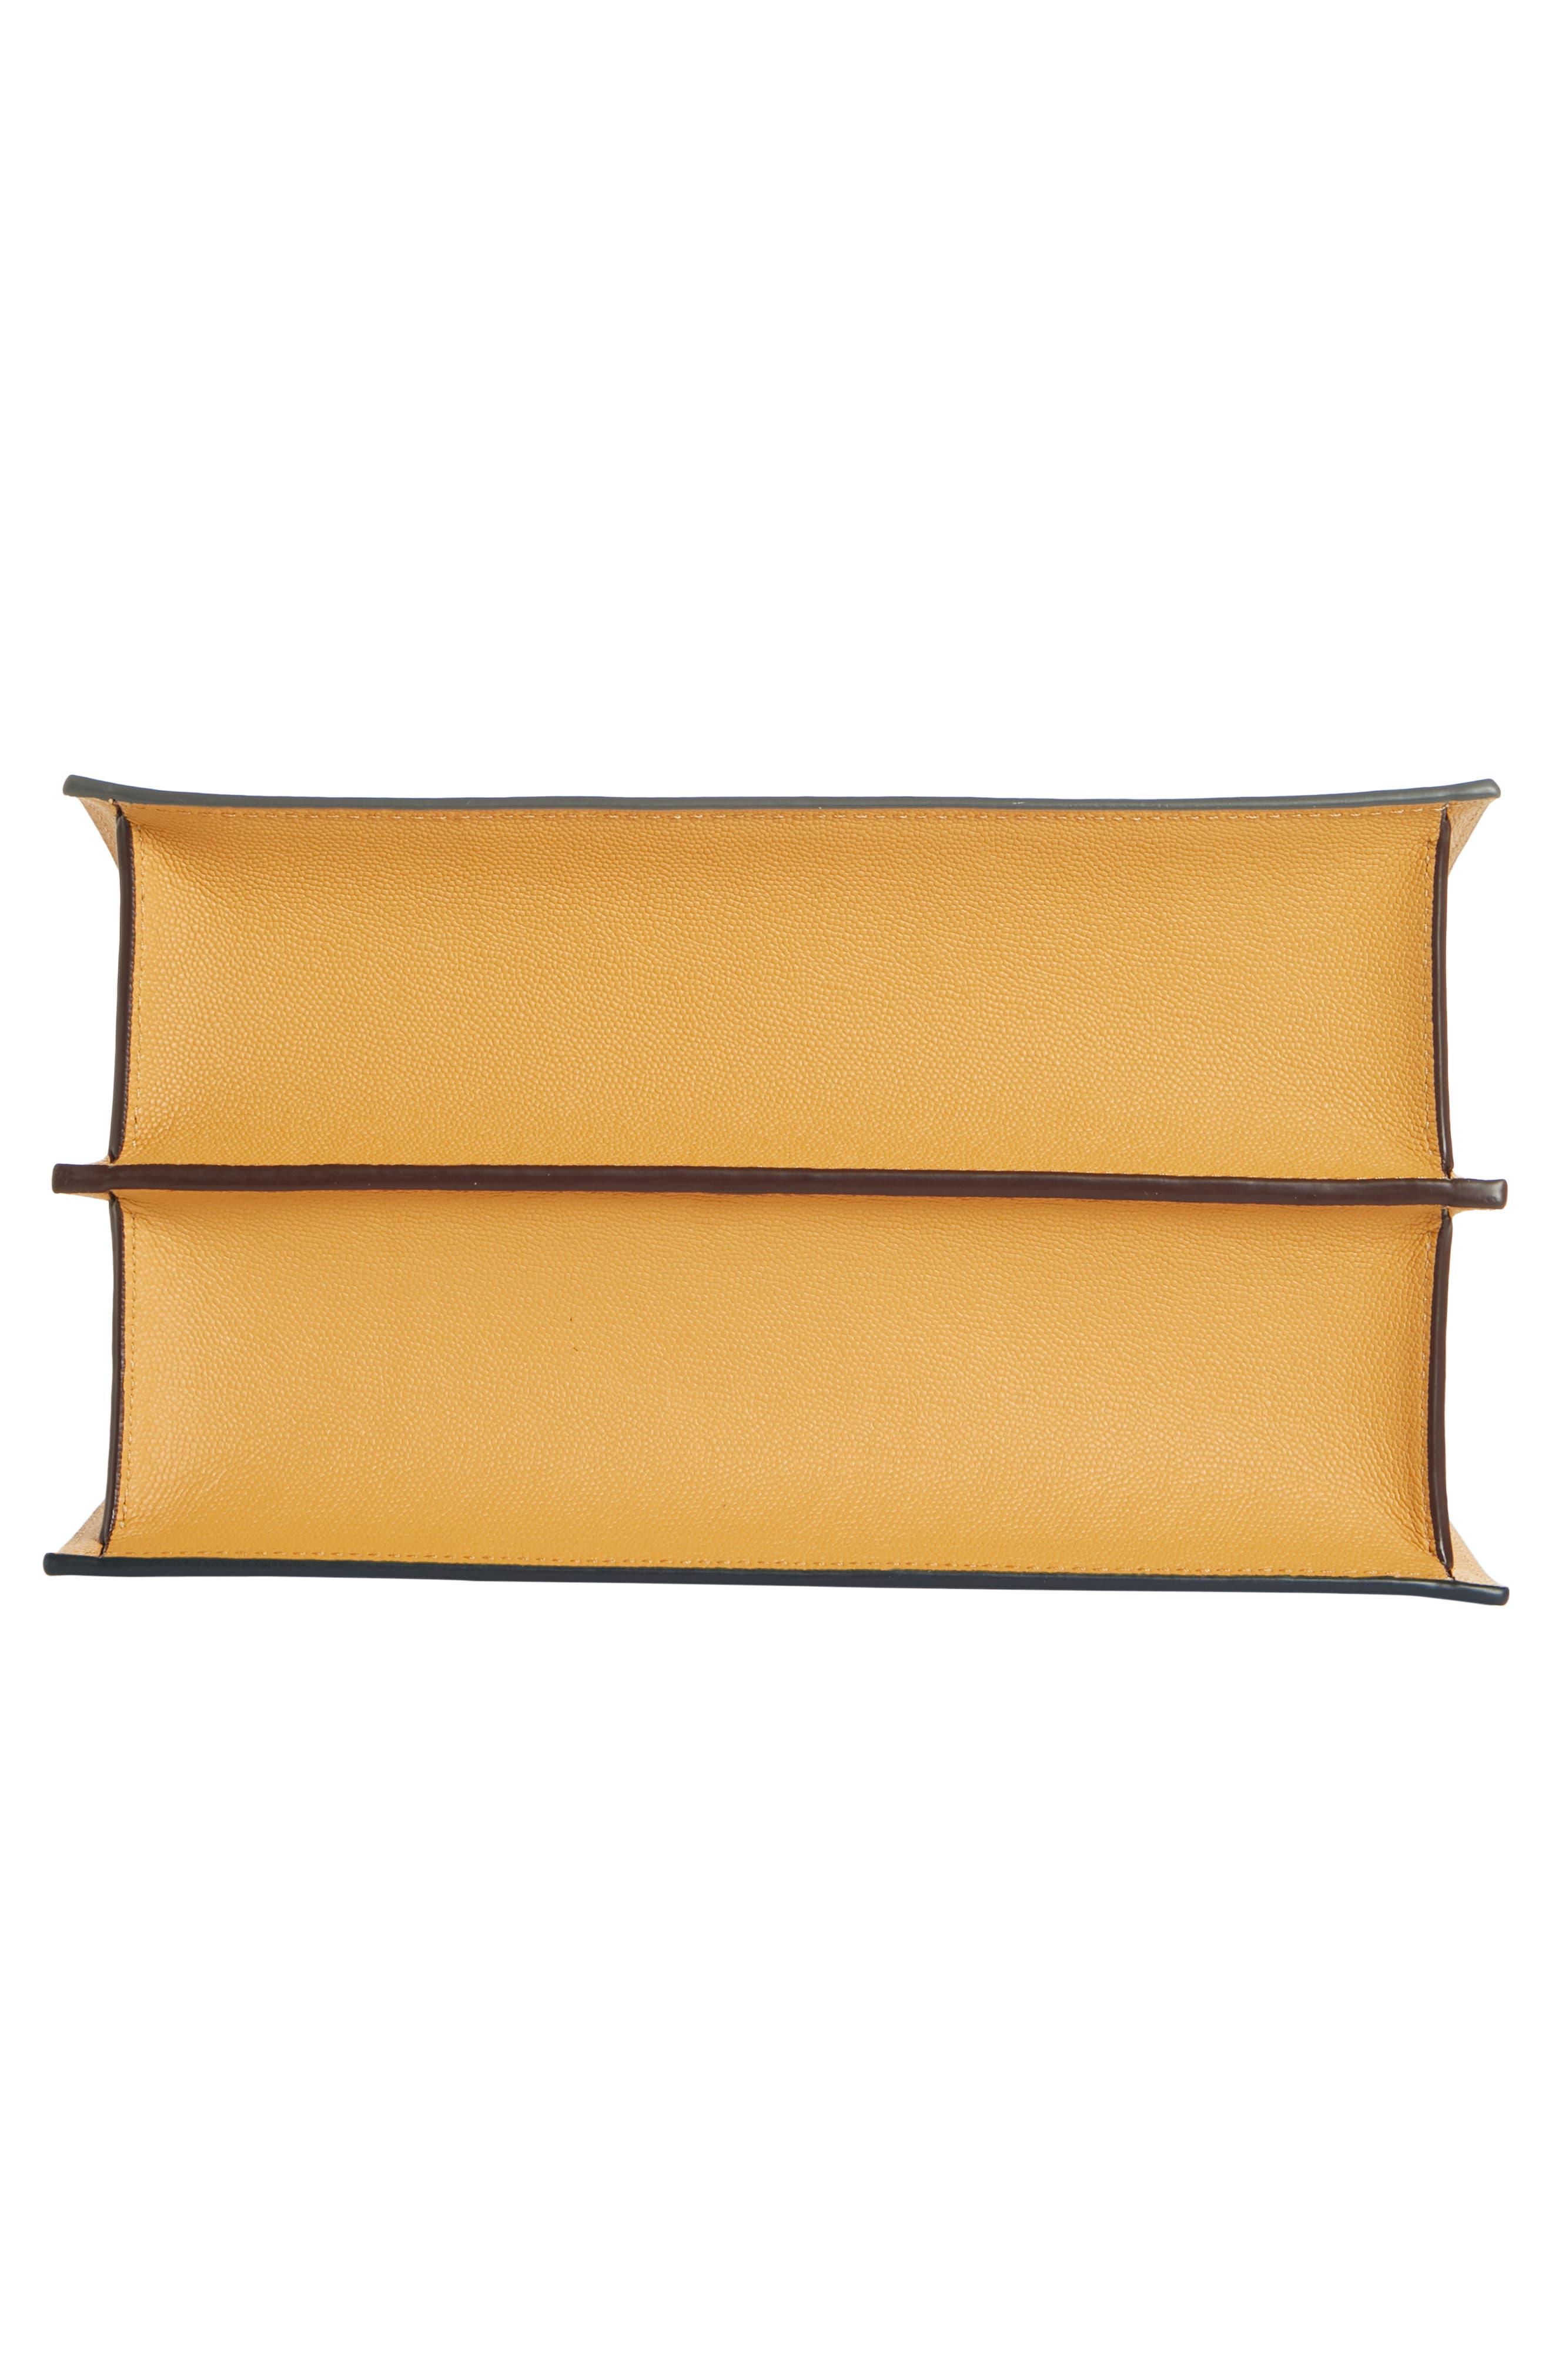 Phoebe Leather Crossbody Bag,                             Alternate thumbnail 6, color,                             MARINE/ SAND